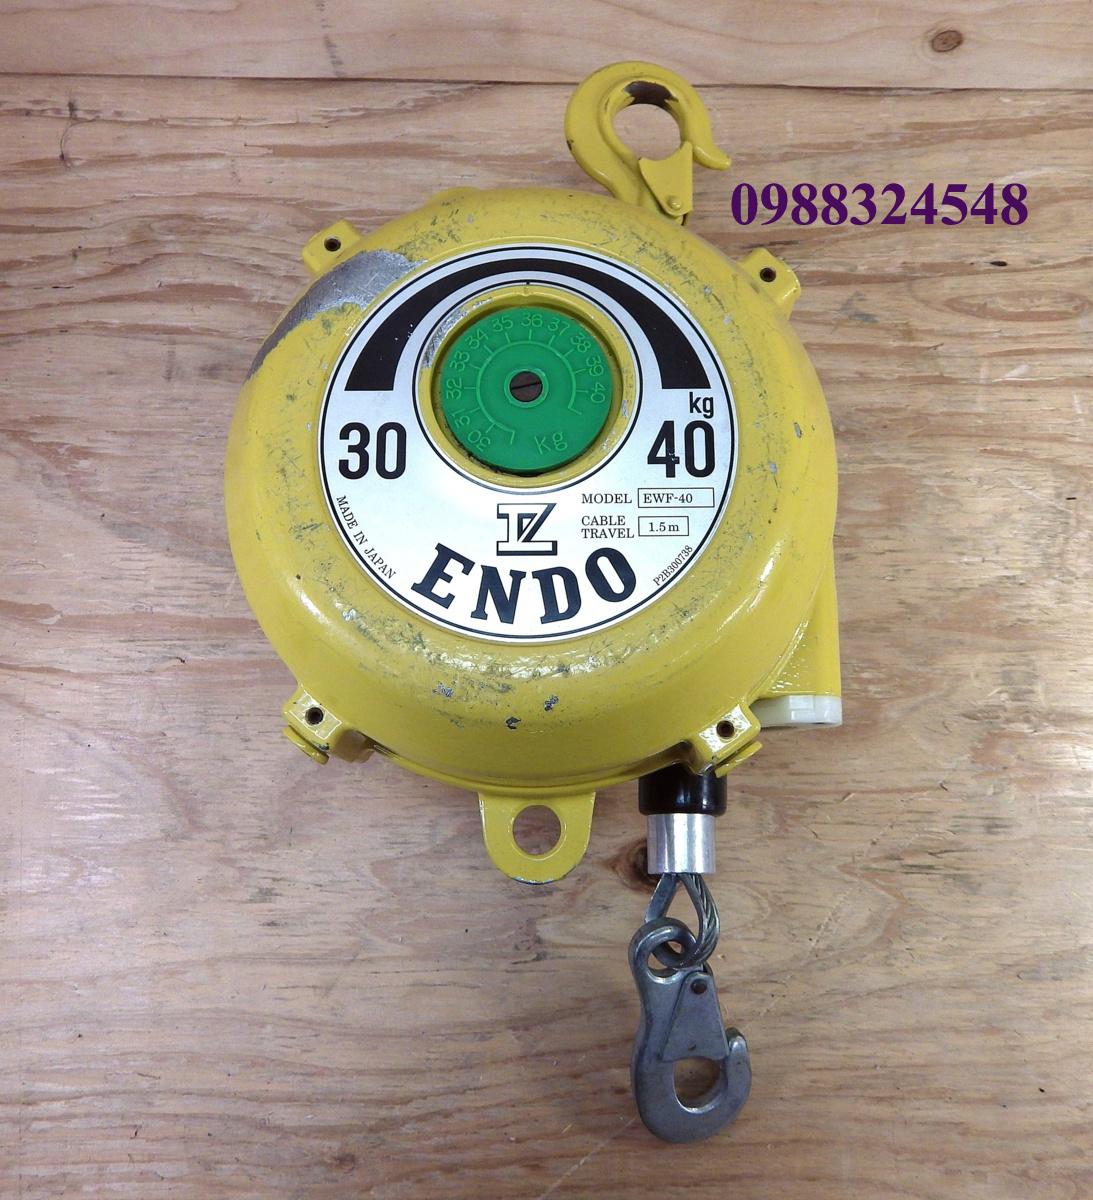 palang cân bằng Endo EWF-40